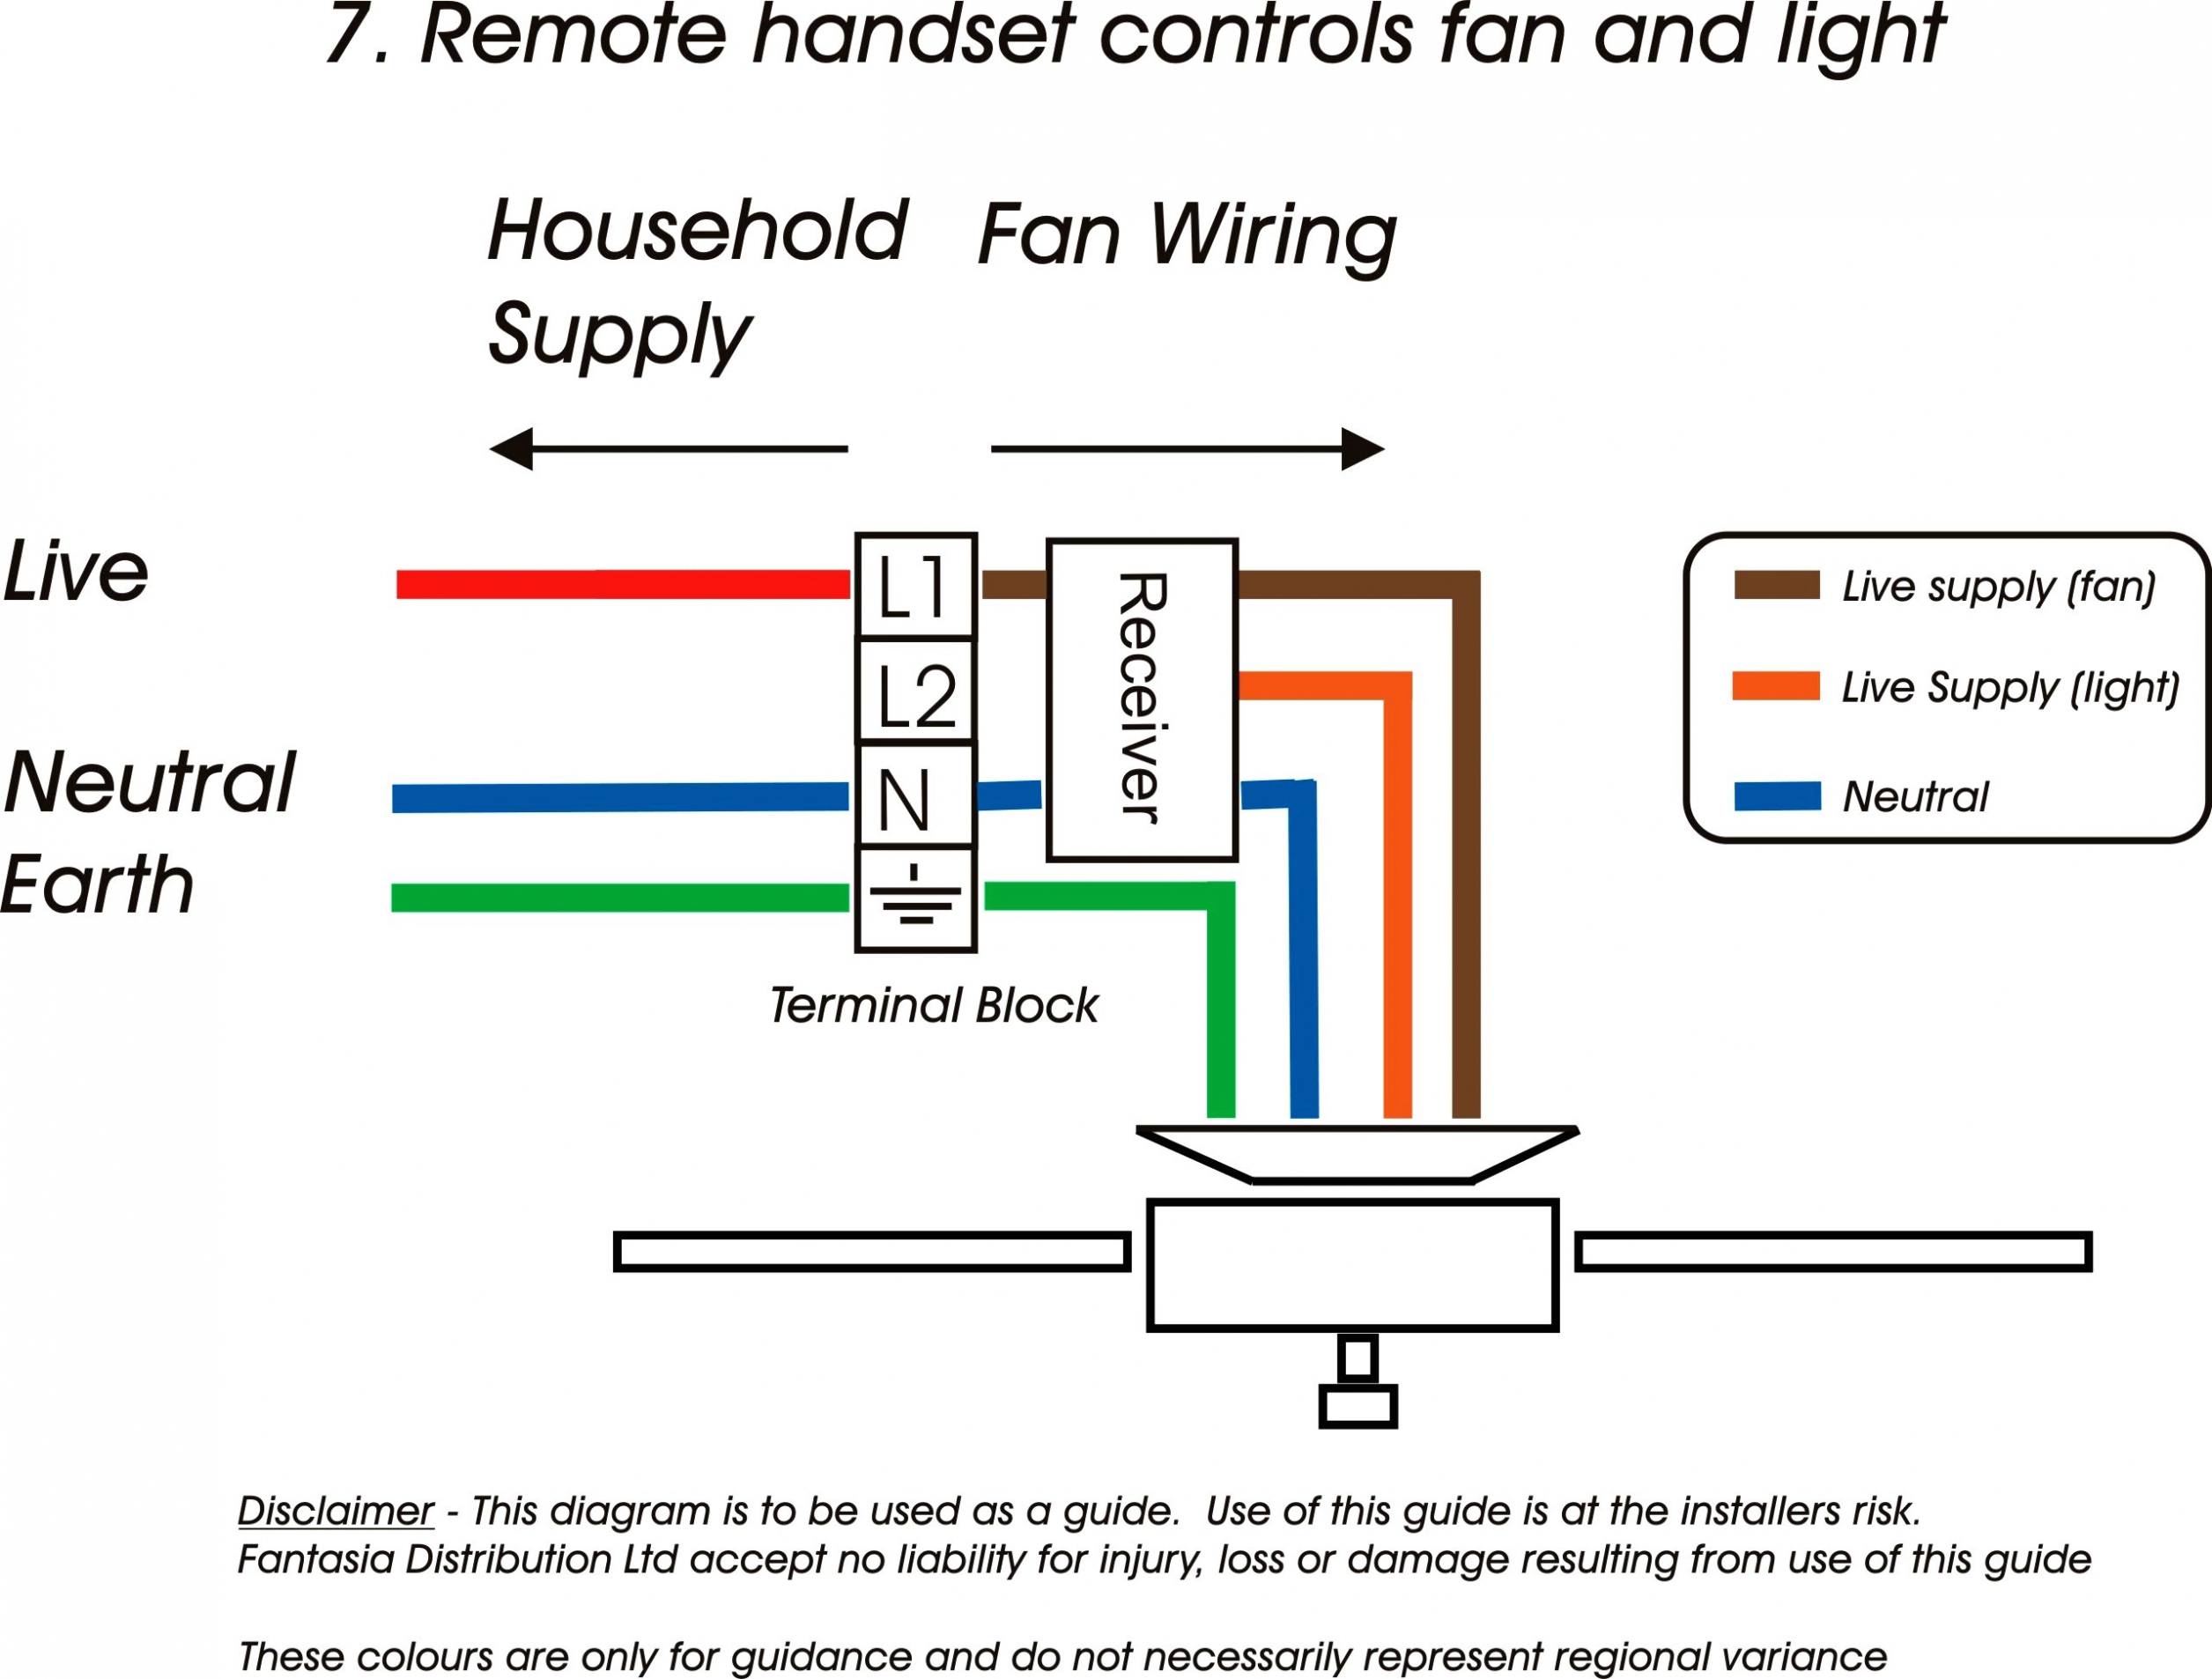 Ibanez S420 Wiring Diagram   online wiring diagram